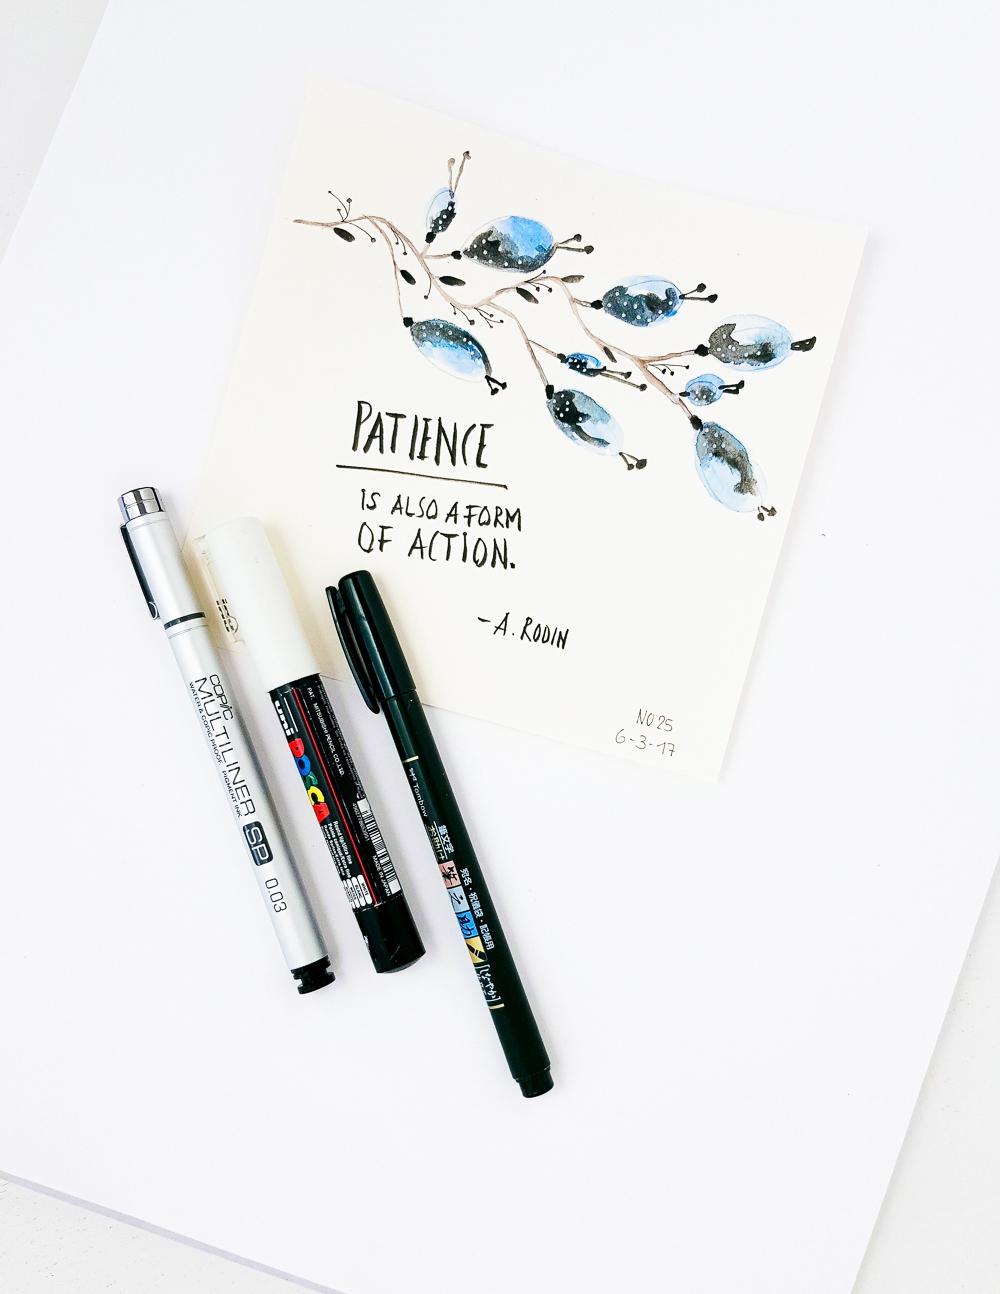 Zitate in Aquarell - die 30 Tage Herausforderung (Teil 3) - Janna Werner